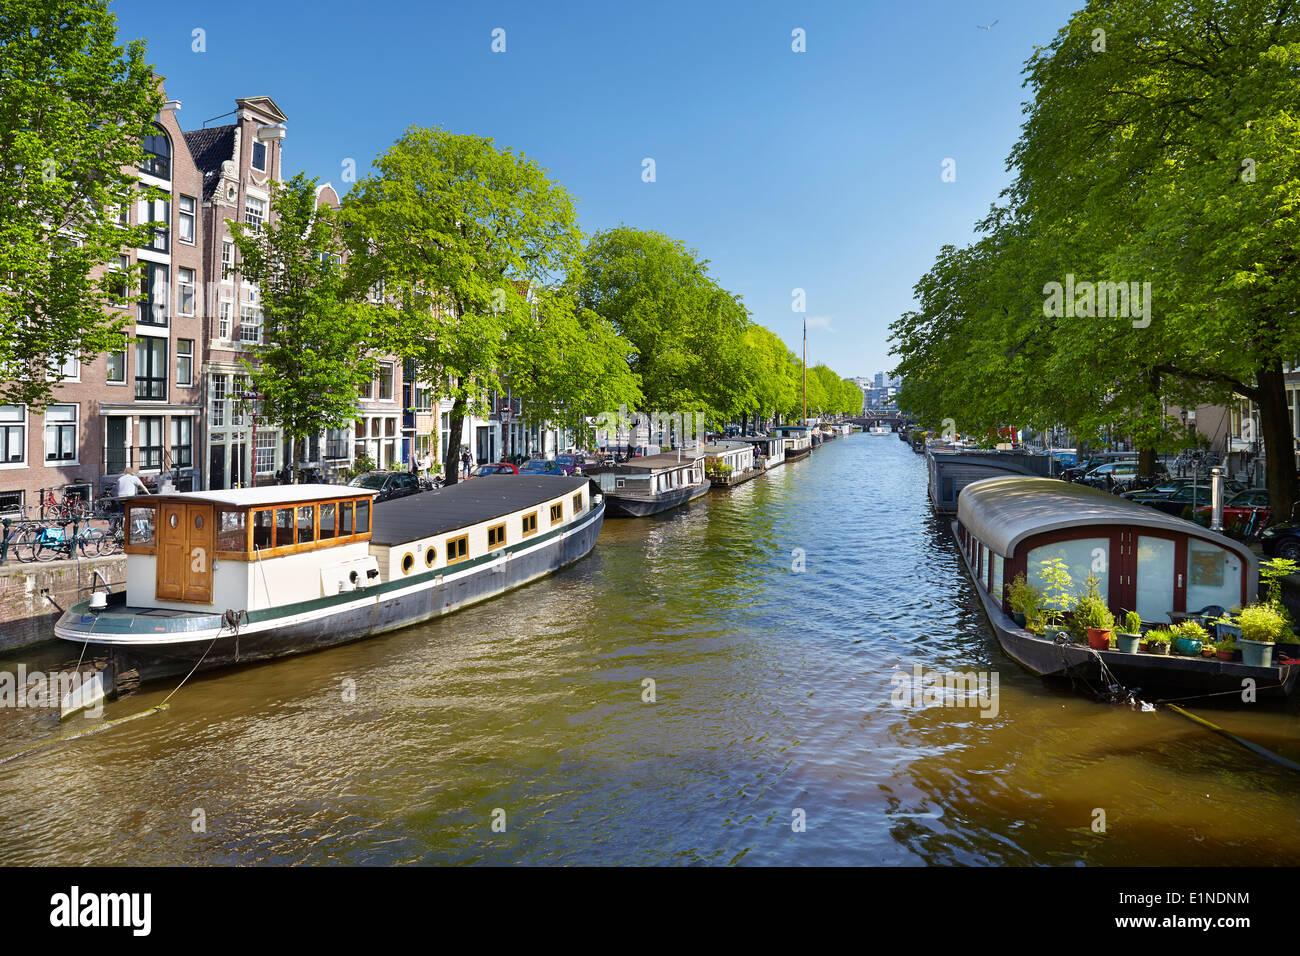 Barcaza en el barco, canal de Amsterdam - Holanda Holanda Imagen De Stock